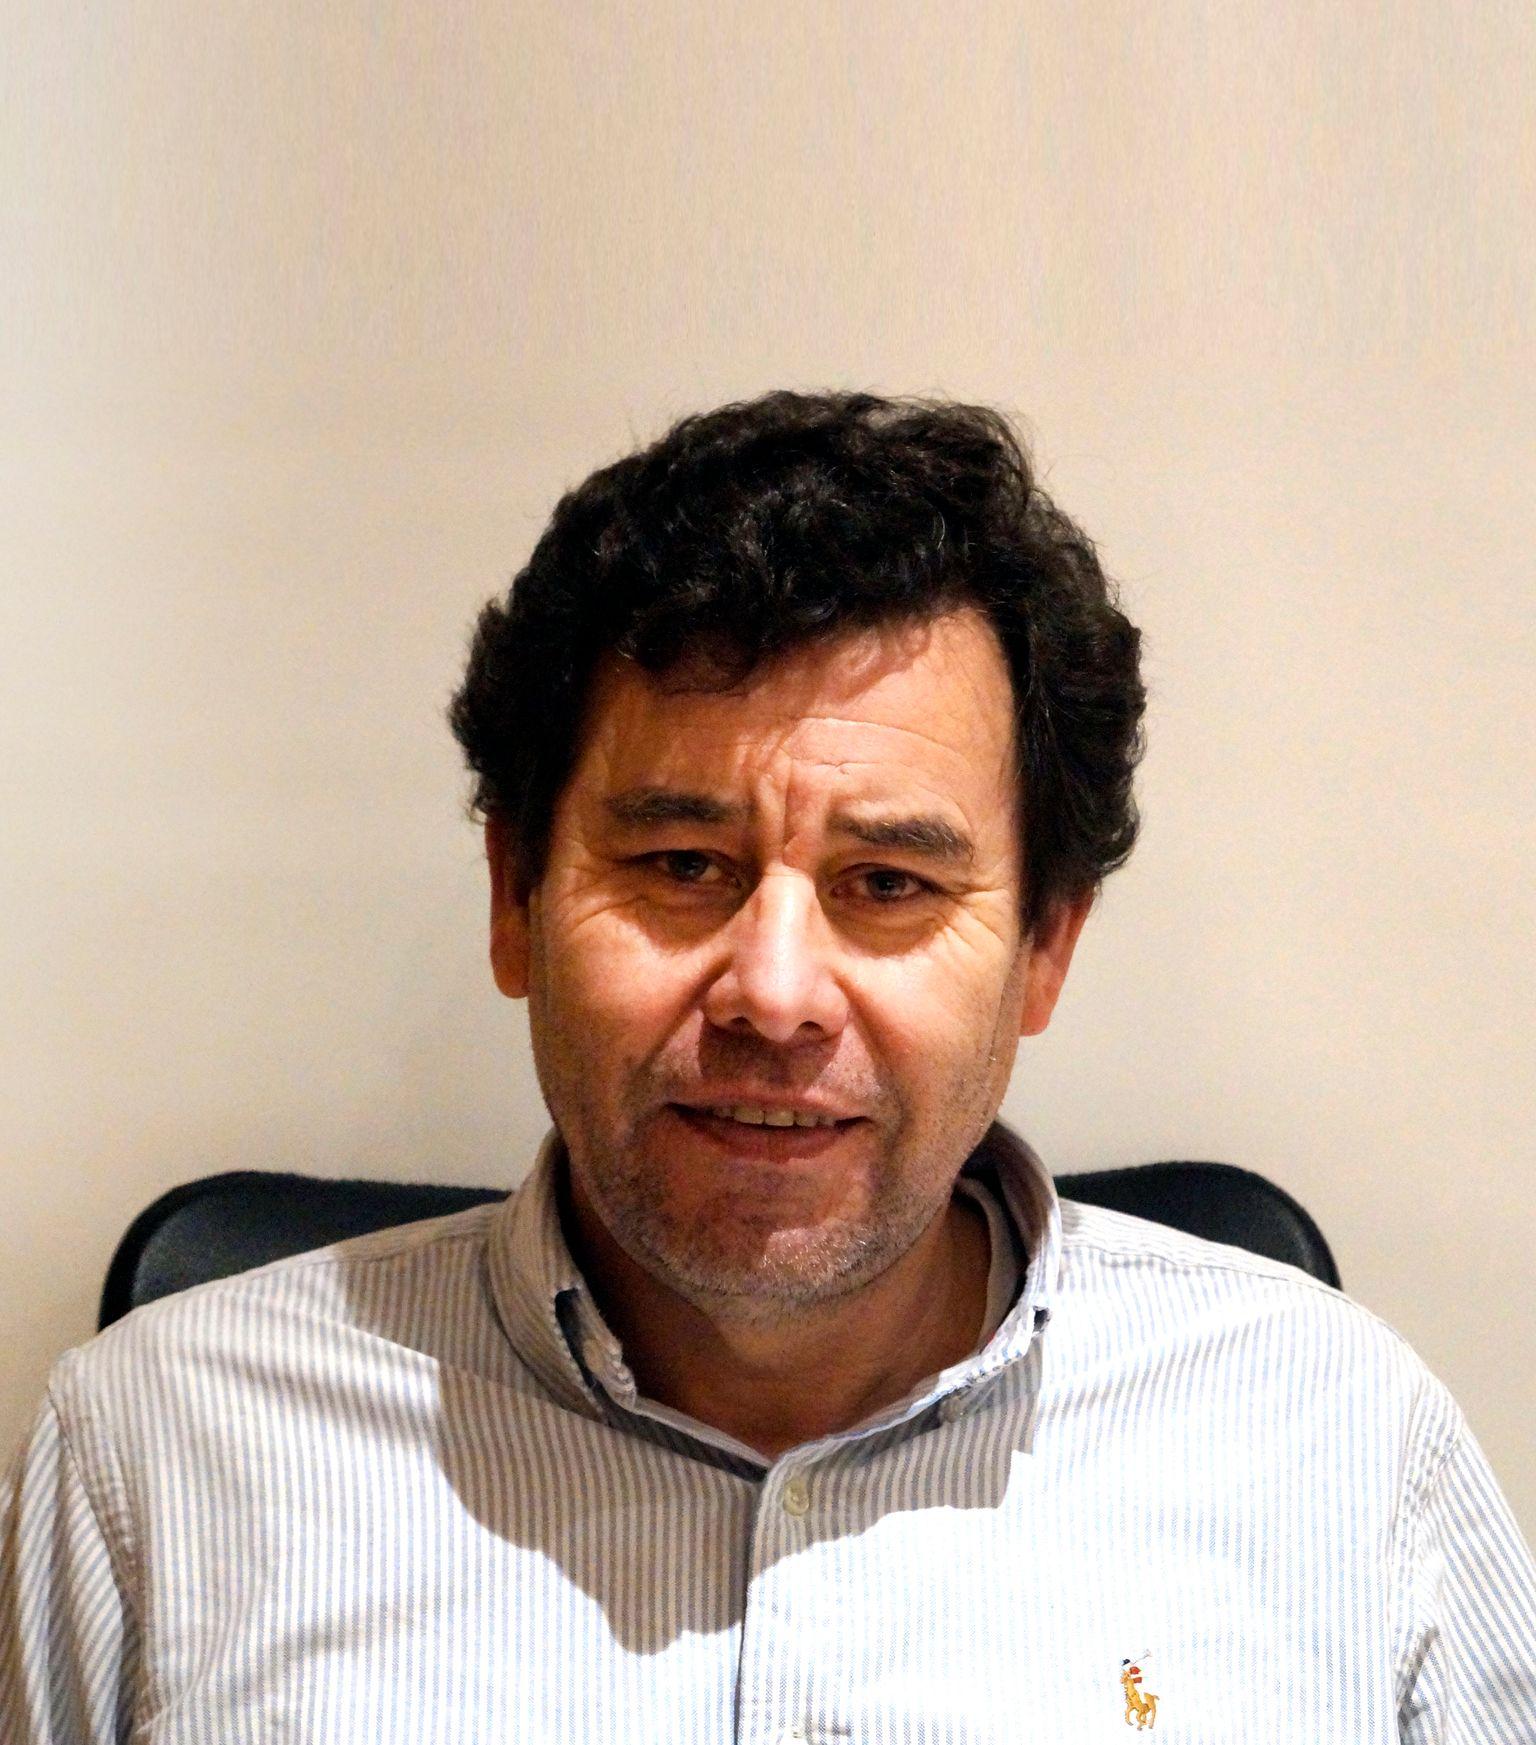 Gonzalo Benítez Muñoz